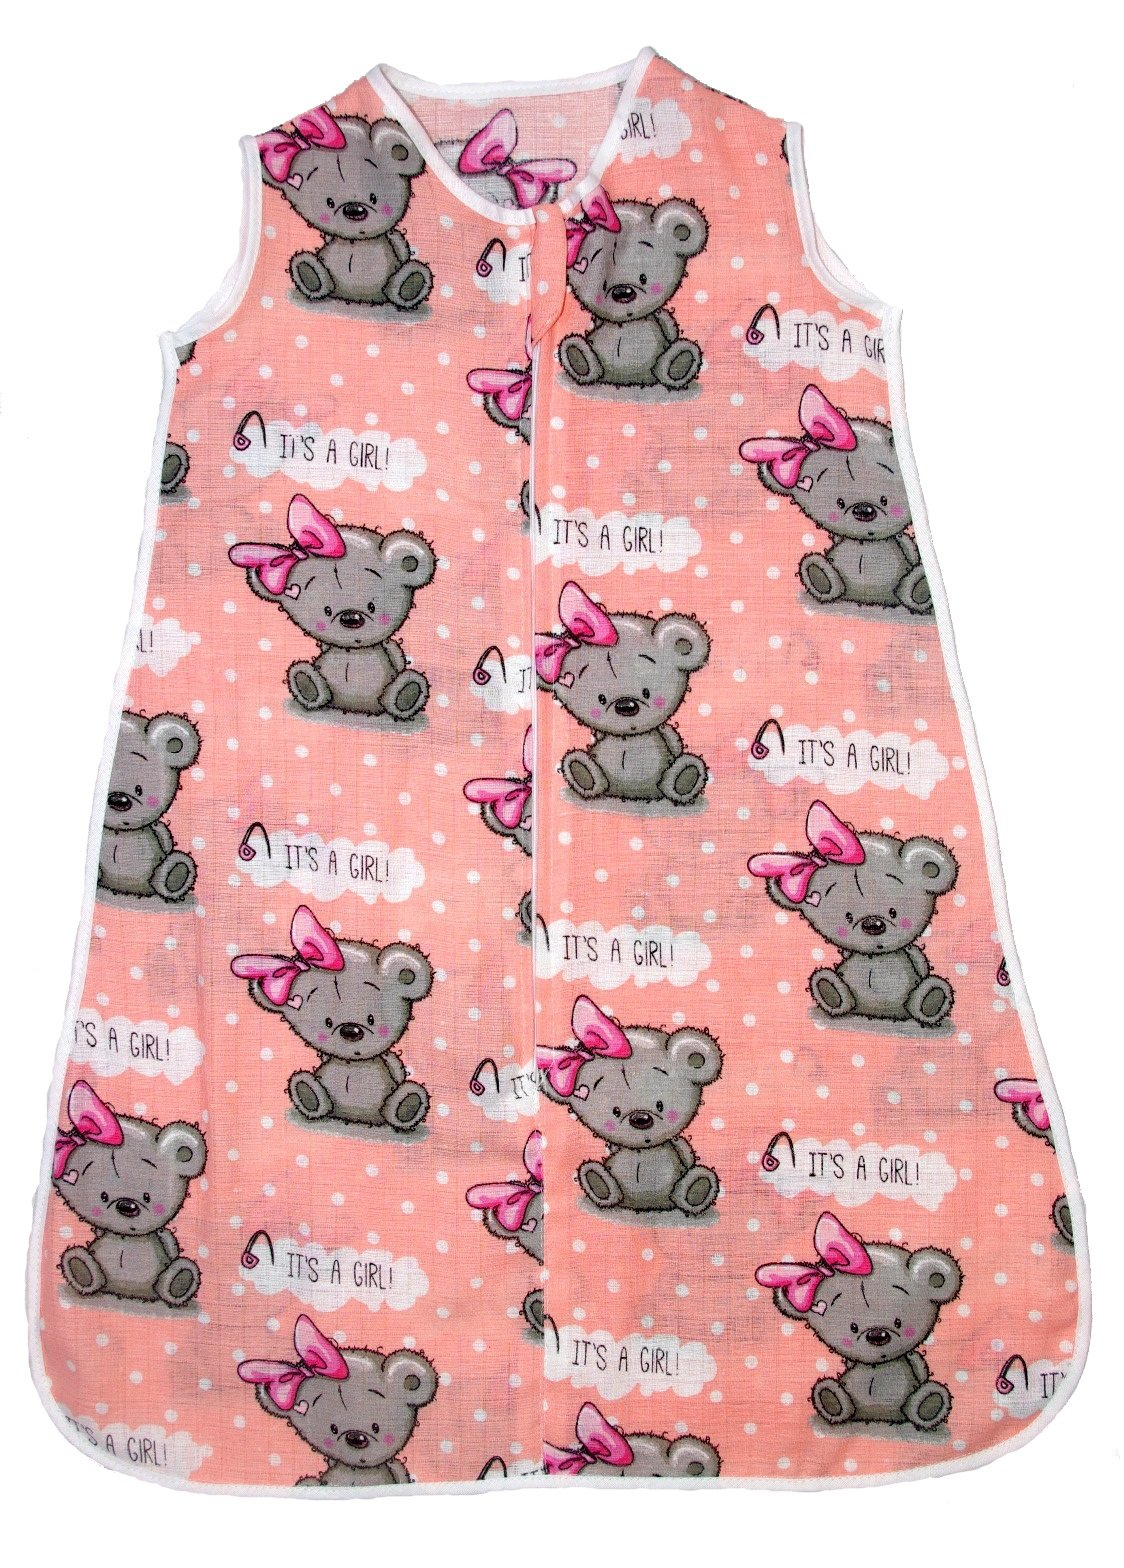 Saco de dormir de muselina de verano para bebé, 0,5 tog rosa 1 Talla:0-6 months (0.5 tog)